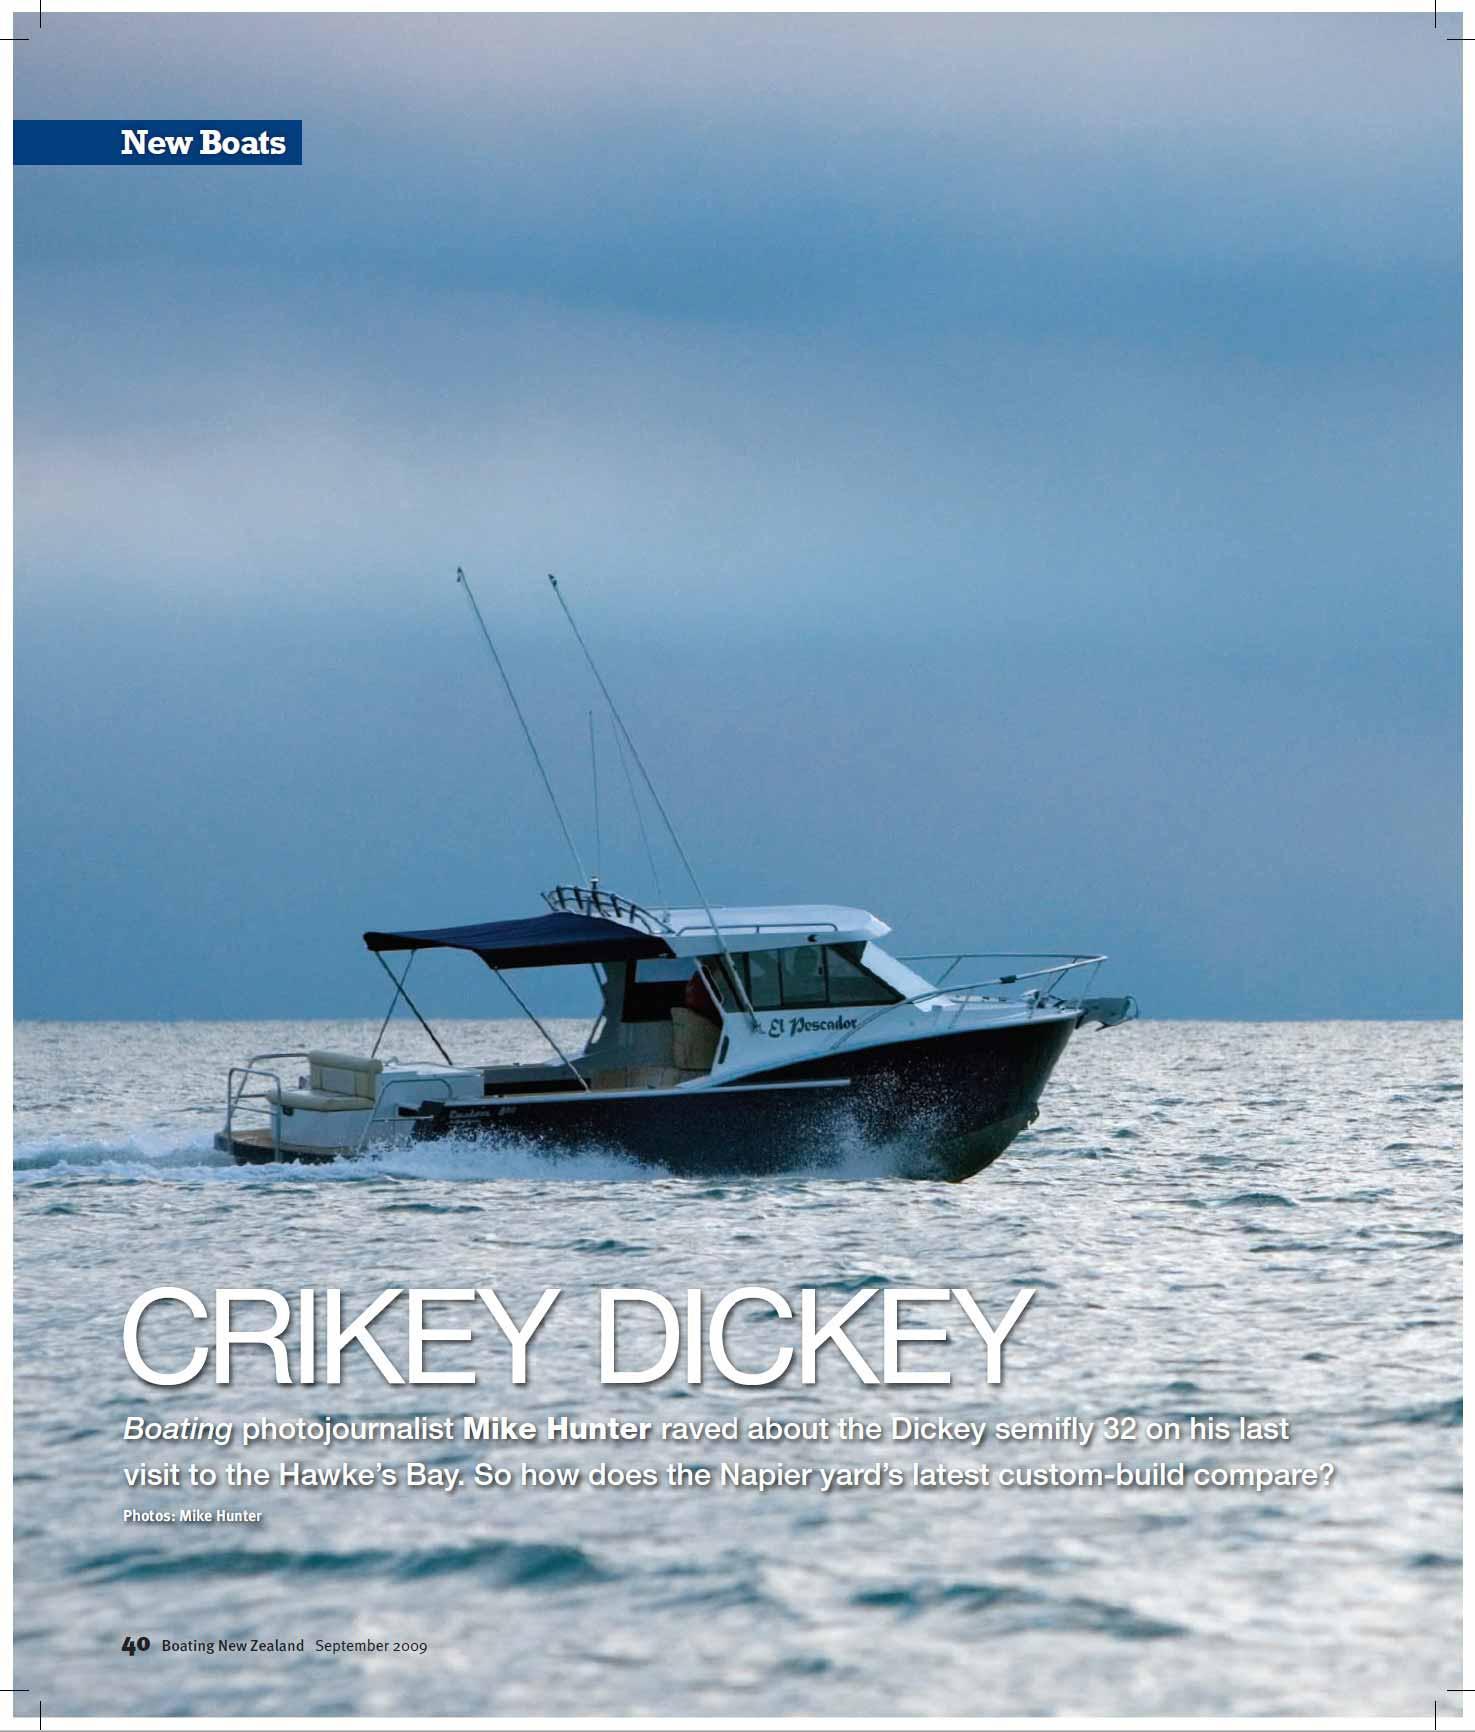 Dickey Custom 800 review - Boating NZ (2009)